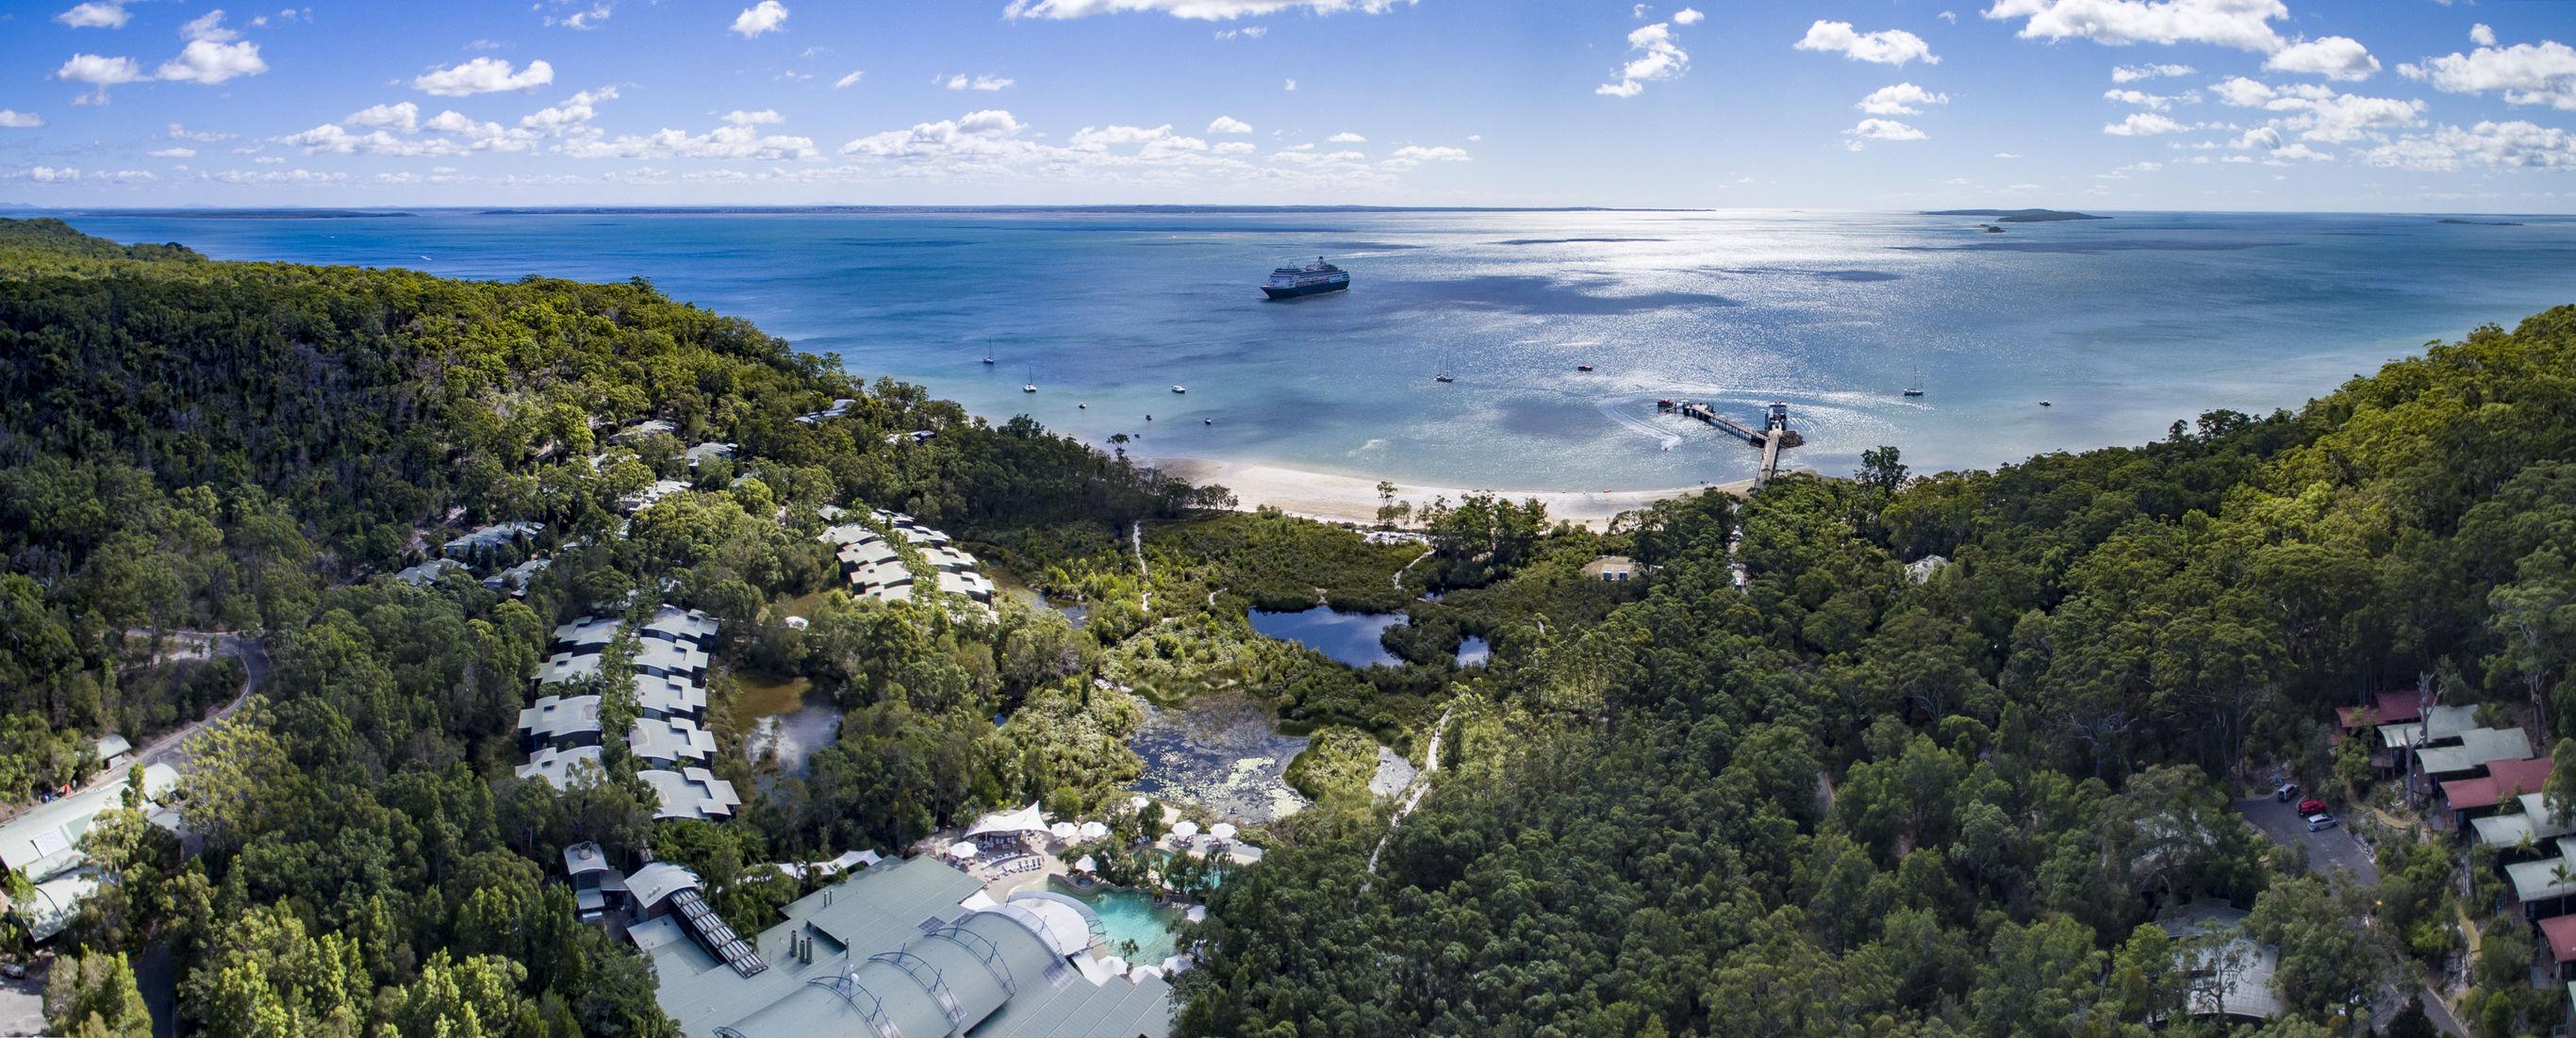 Australie-Fraser-Island-Kingfisher-Bay-Resort_1_575489 China